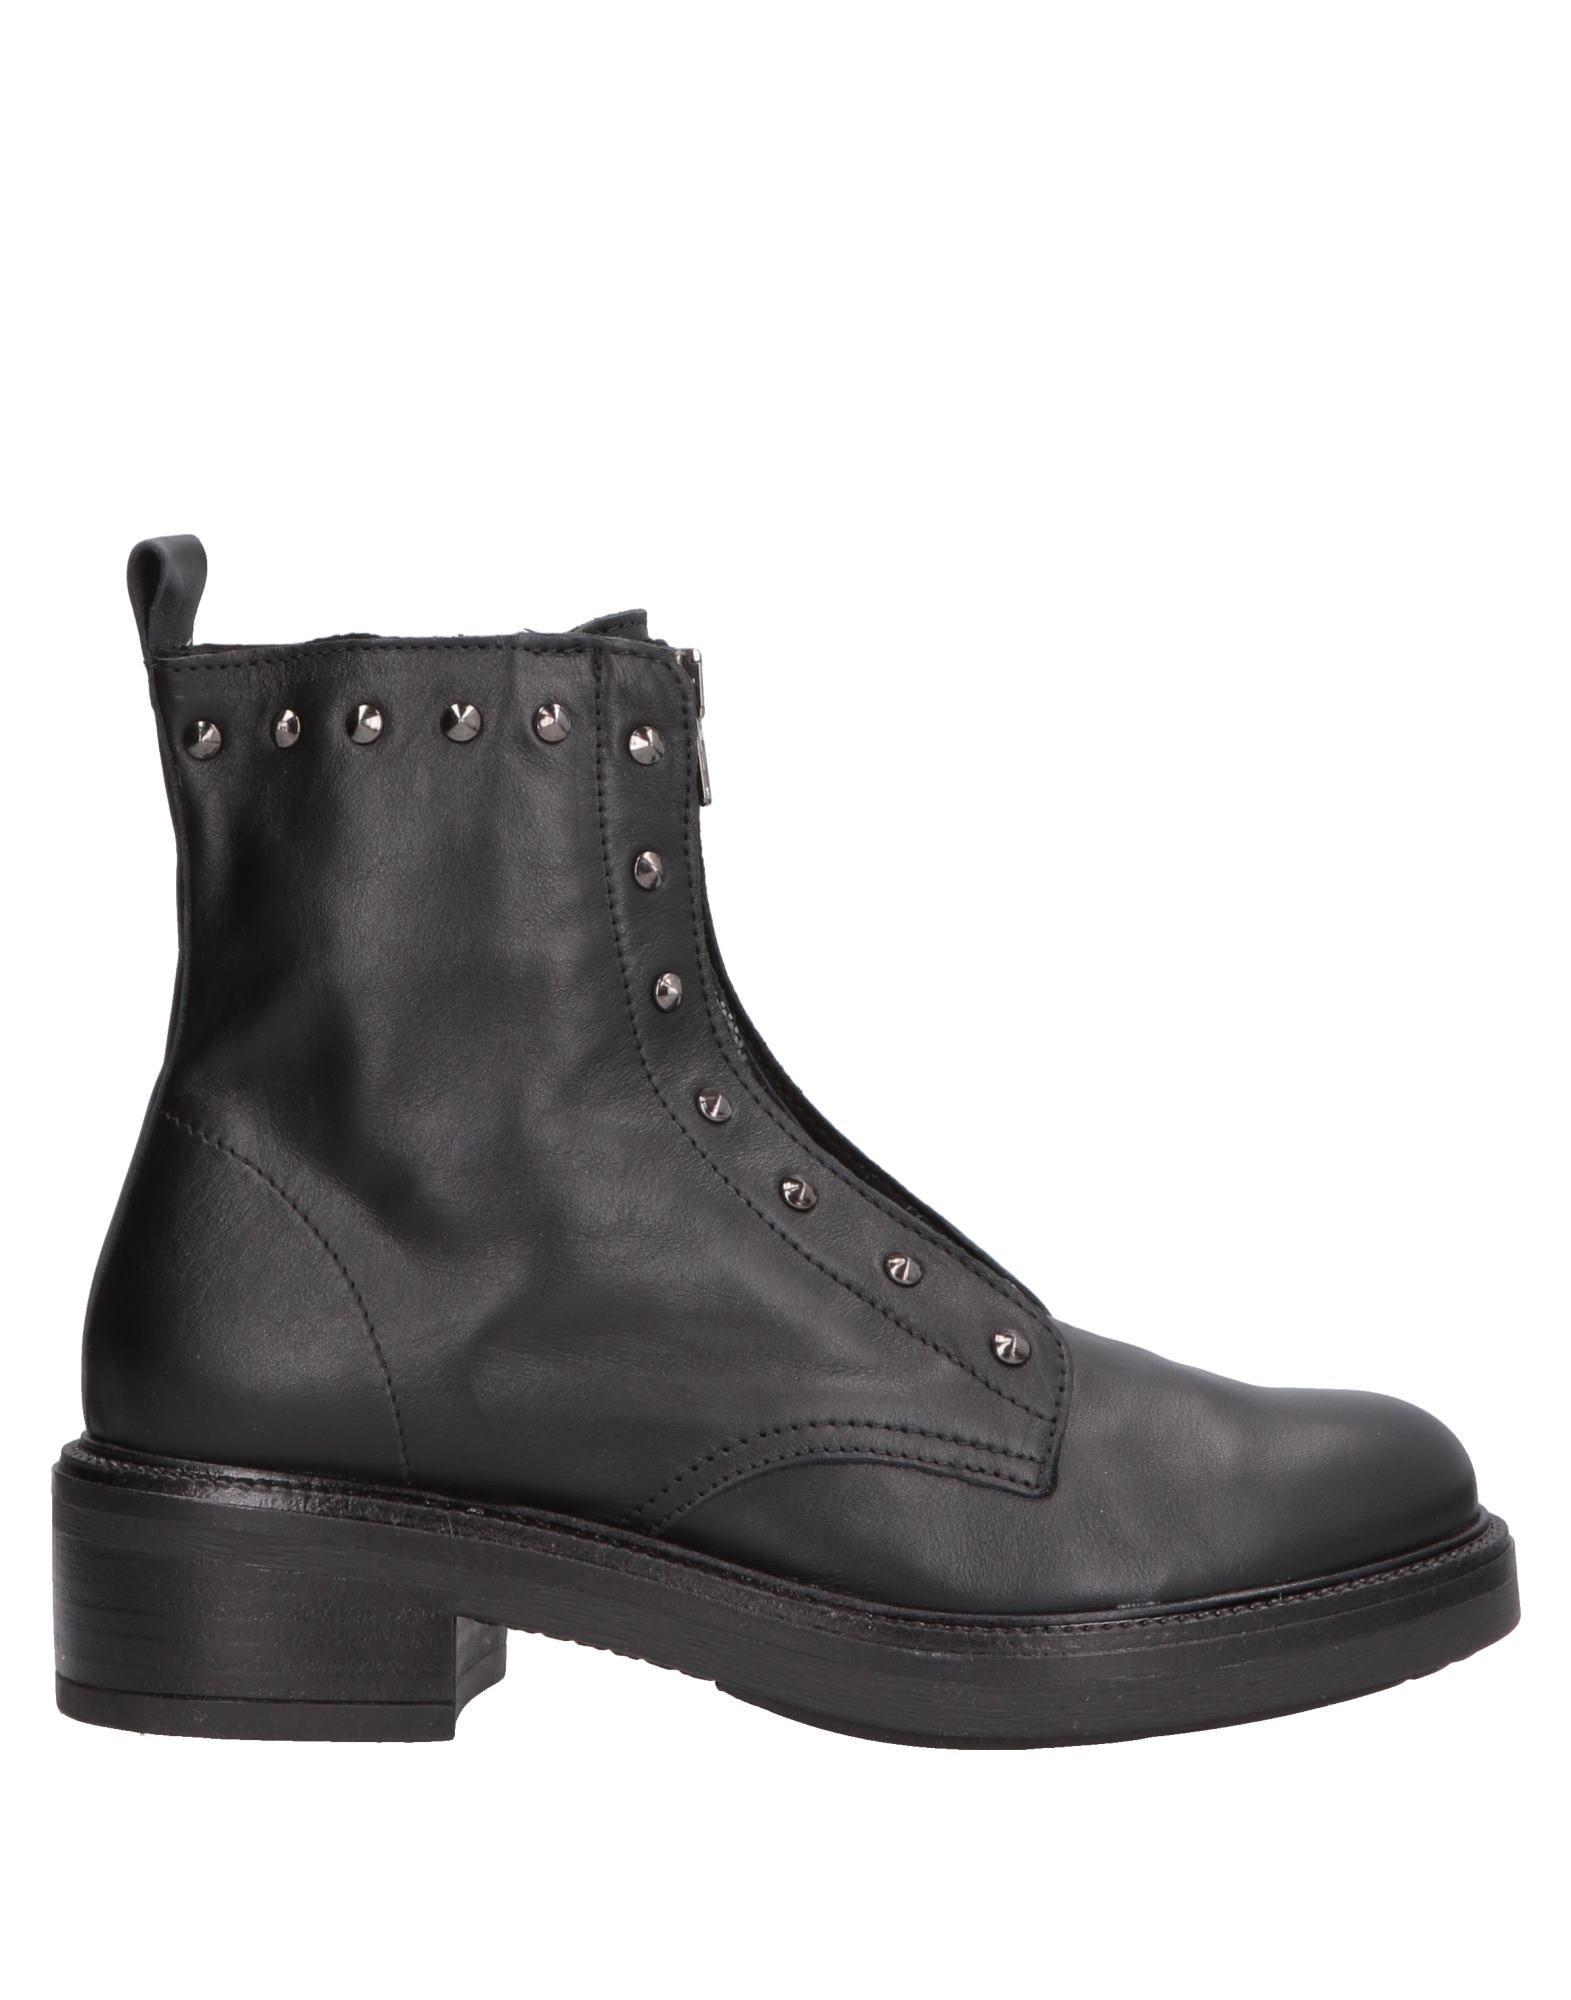 Stilvolle billige Schuhe Manuela Dardozzi Stiefelette Damen  11570224CJ